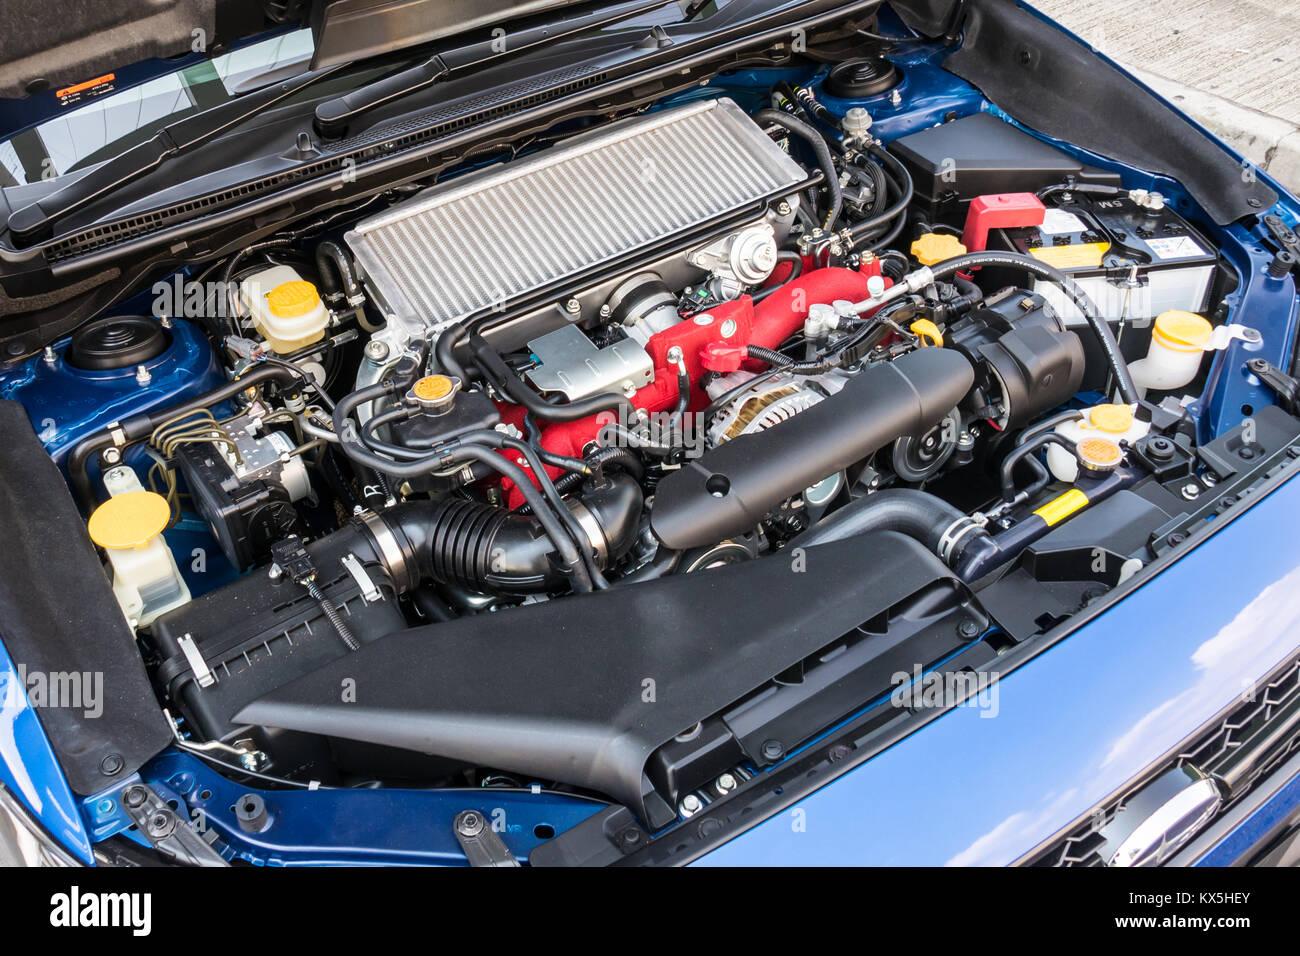 Hong Kong China Sept 11 2017 Subaru Wrx Sti 2017 Engine Sept 11 Stock Photo Alamy